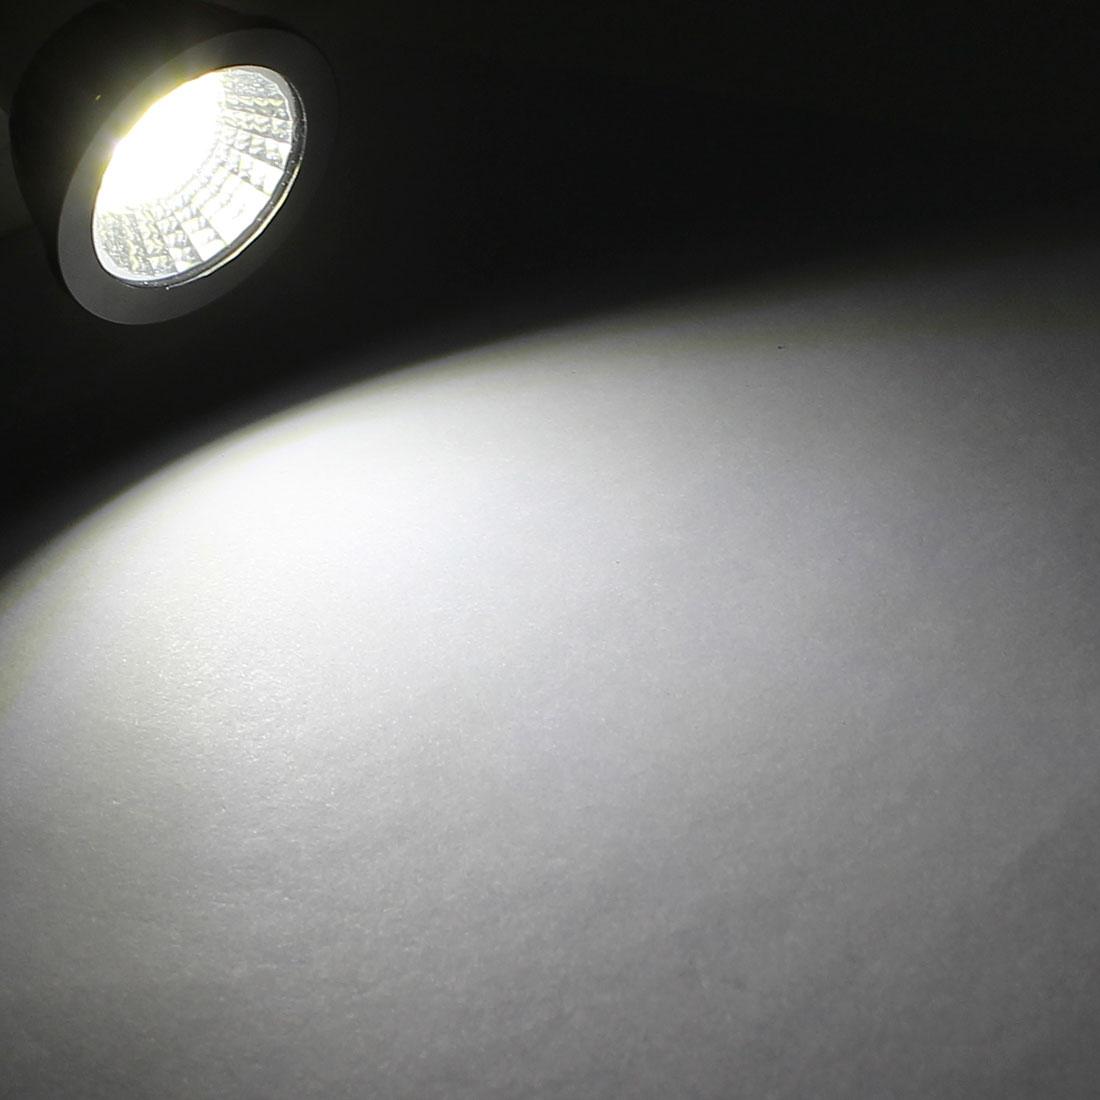 AC85-265V-3W-Power-GU10-Base-COB-LED-Spotlight-Bulb-Downlight-Pure-White